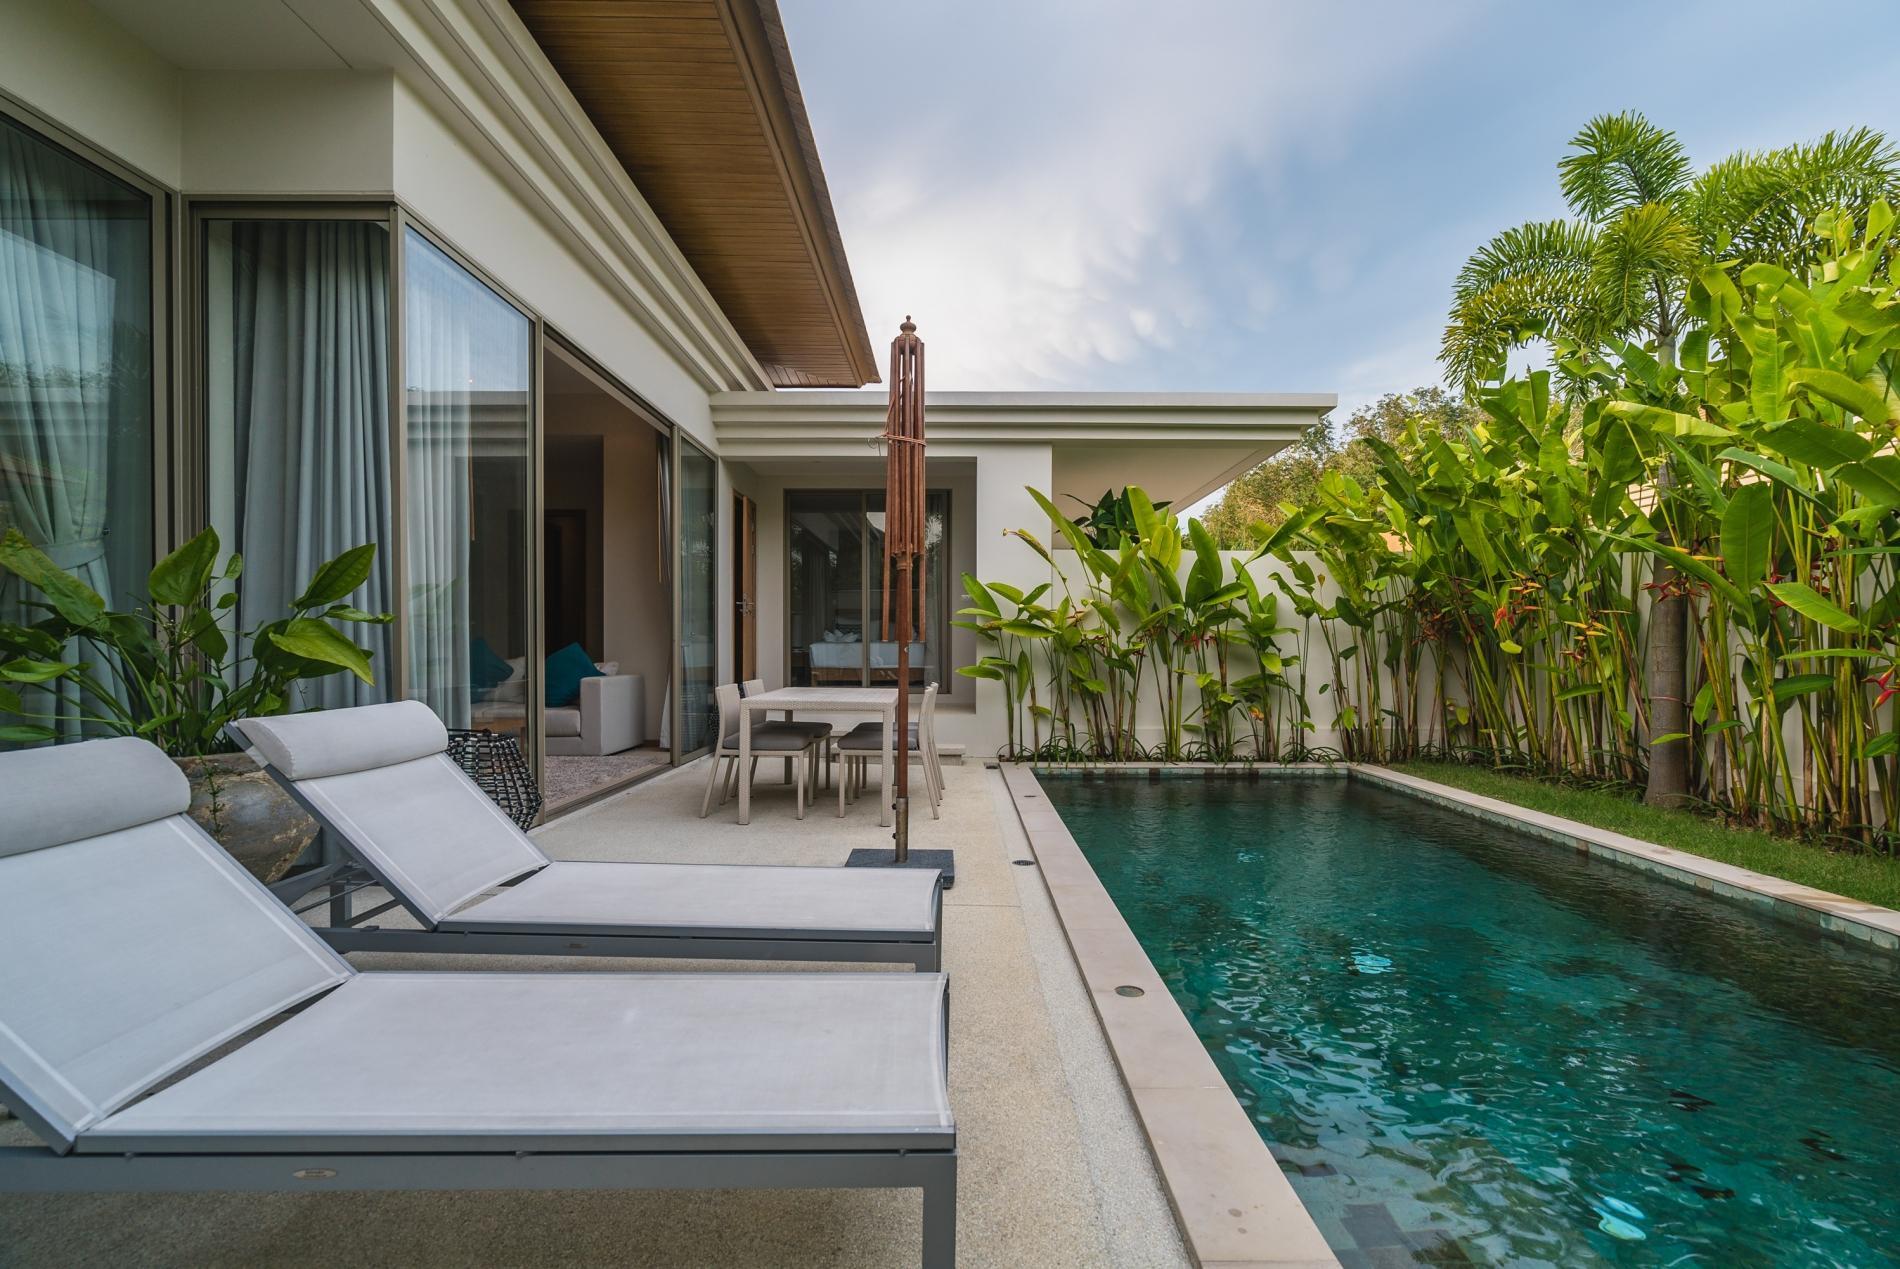 Apartment Trichada 18 - Private pool modern 3 bedroom villa photo 18647198